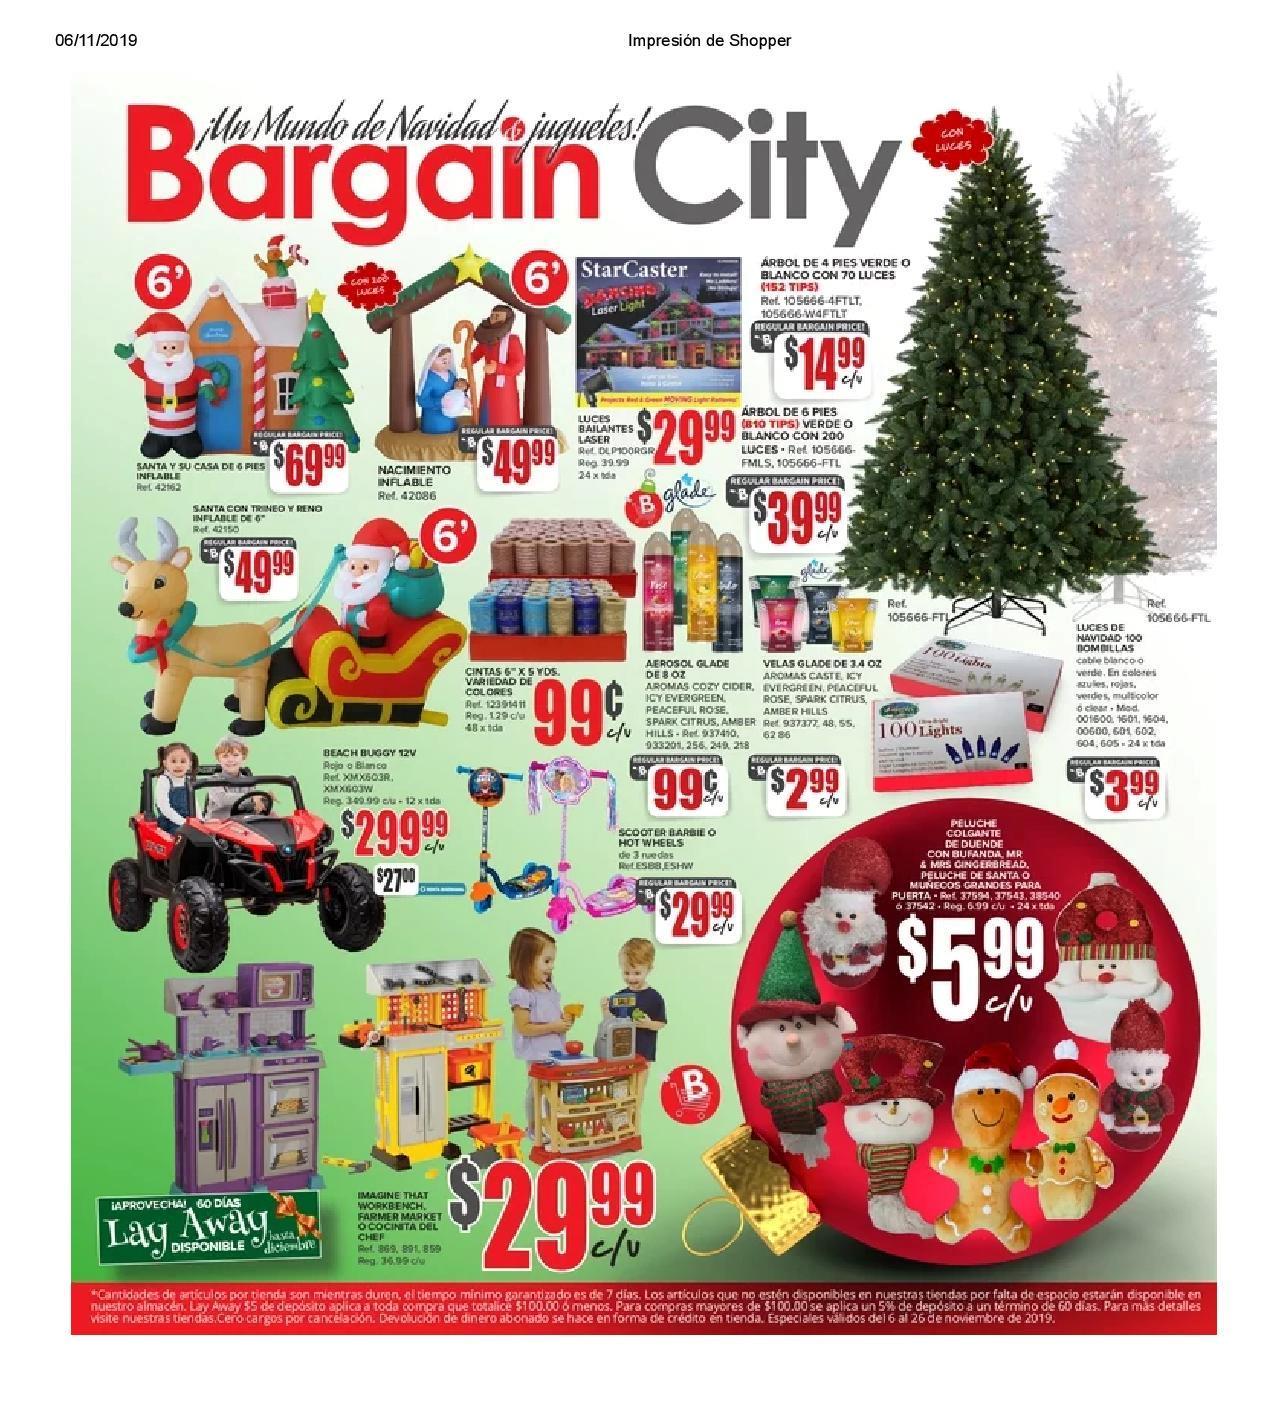 Shopper Bargain City 6 de Noviembre al 26 de Noviembre de 2019